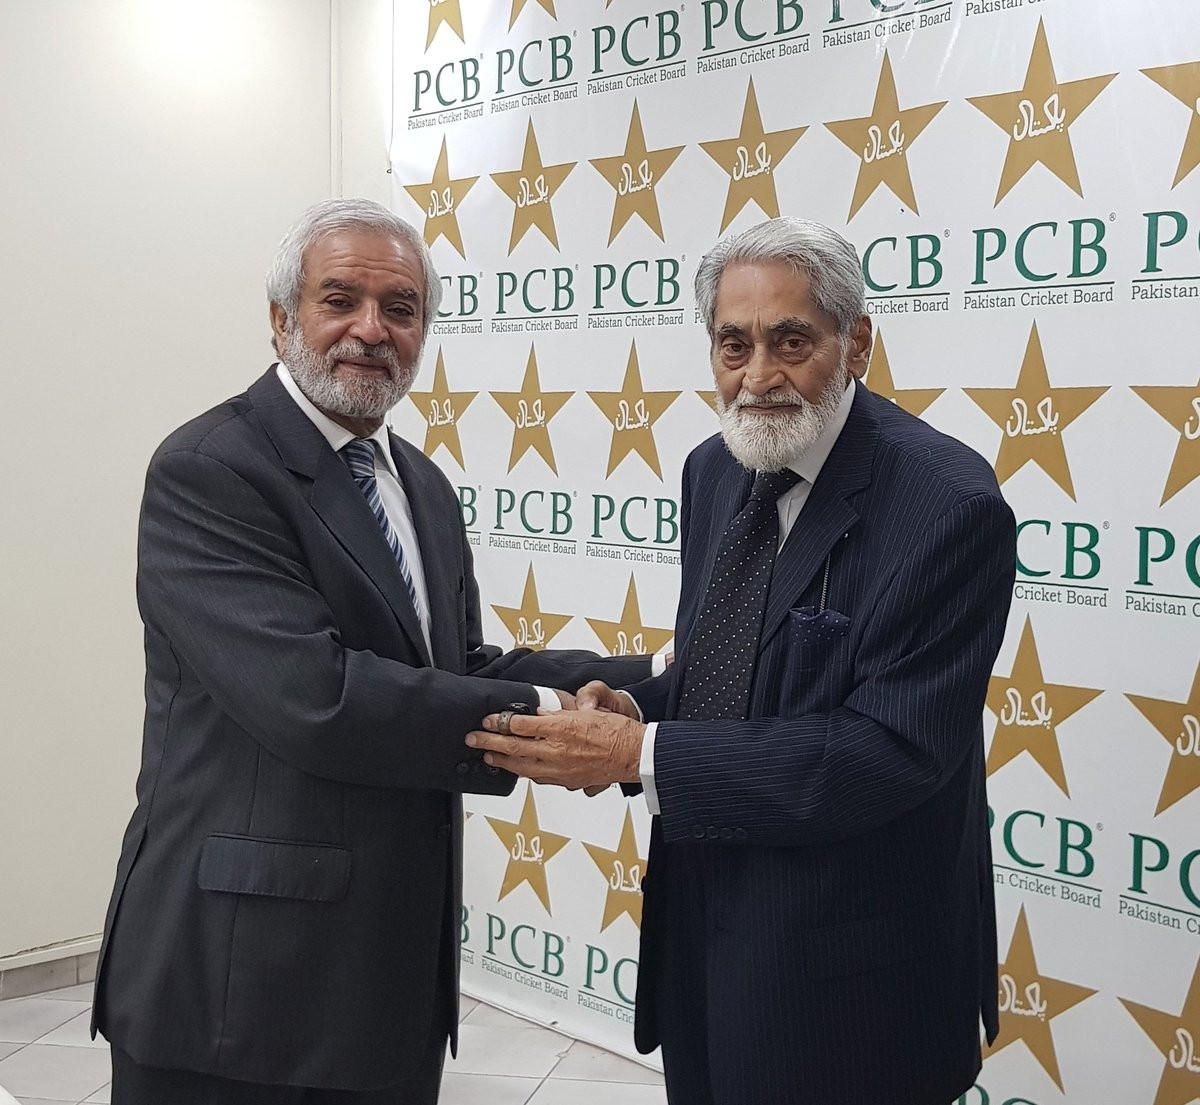 Former ICC head Mani elected chairman of Pakistan Cricket Board